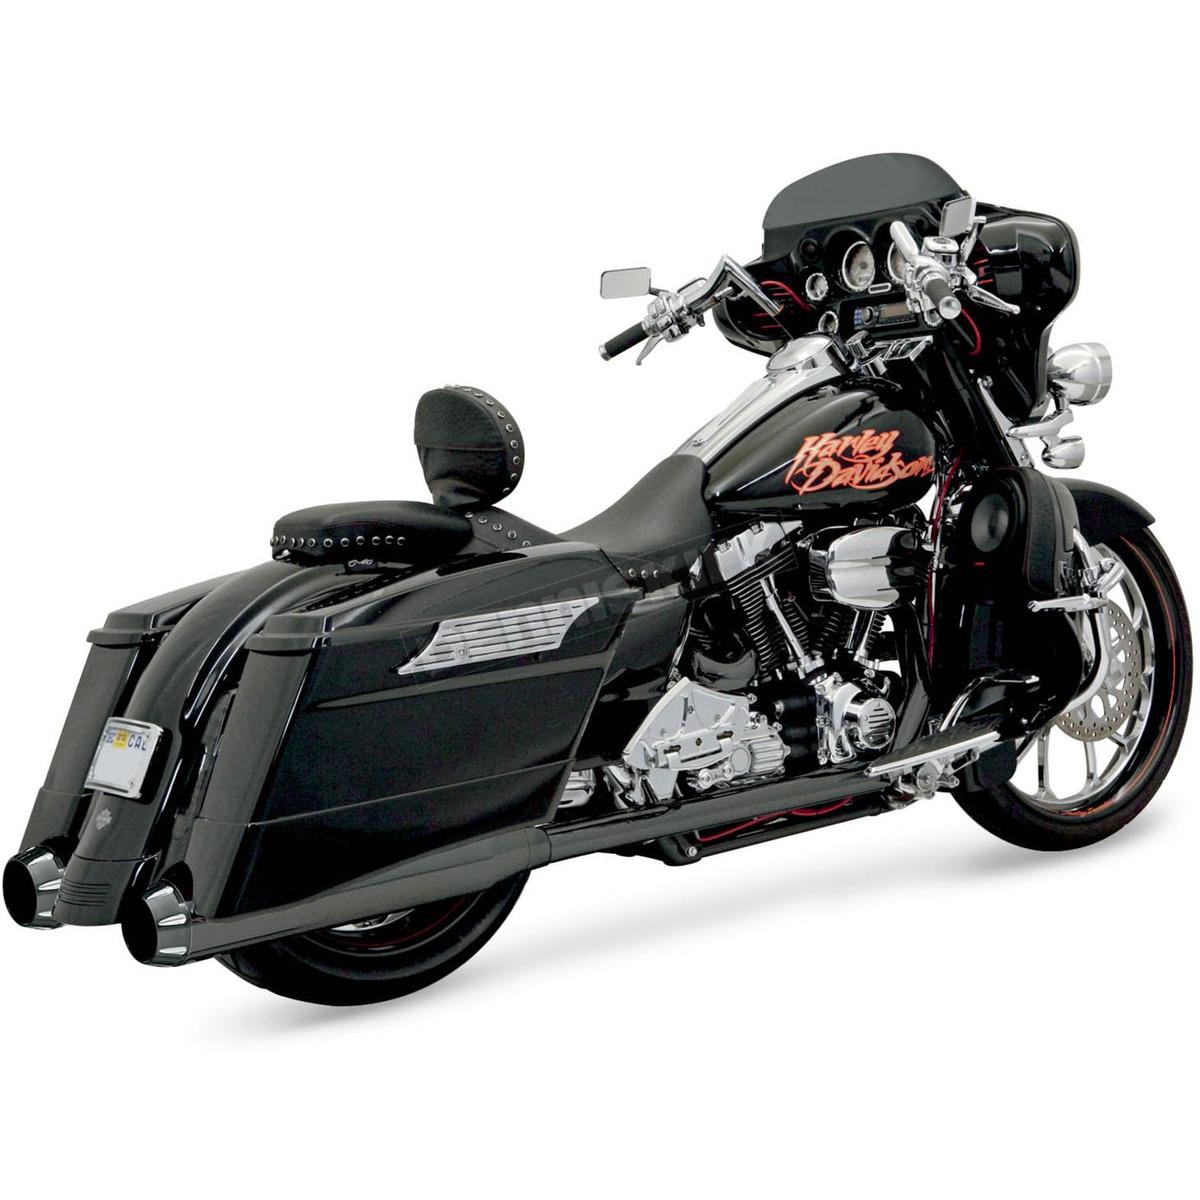 black ceramic p bagger stepped true dual exhaust system with power curve b1 muffler w black end caps 1f56rb